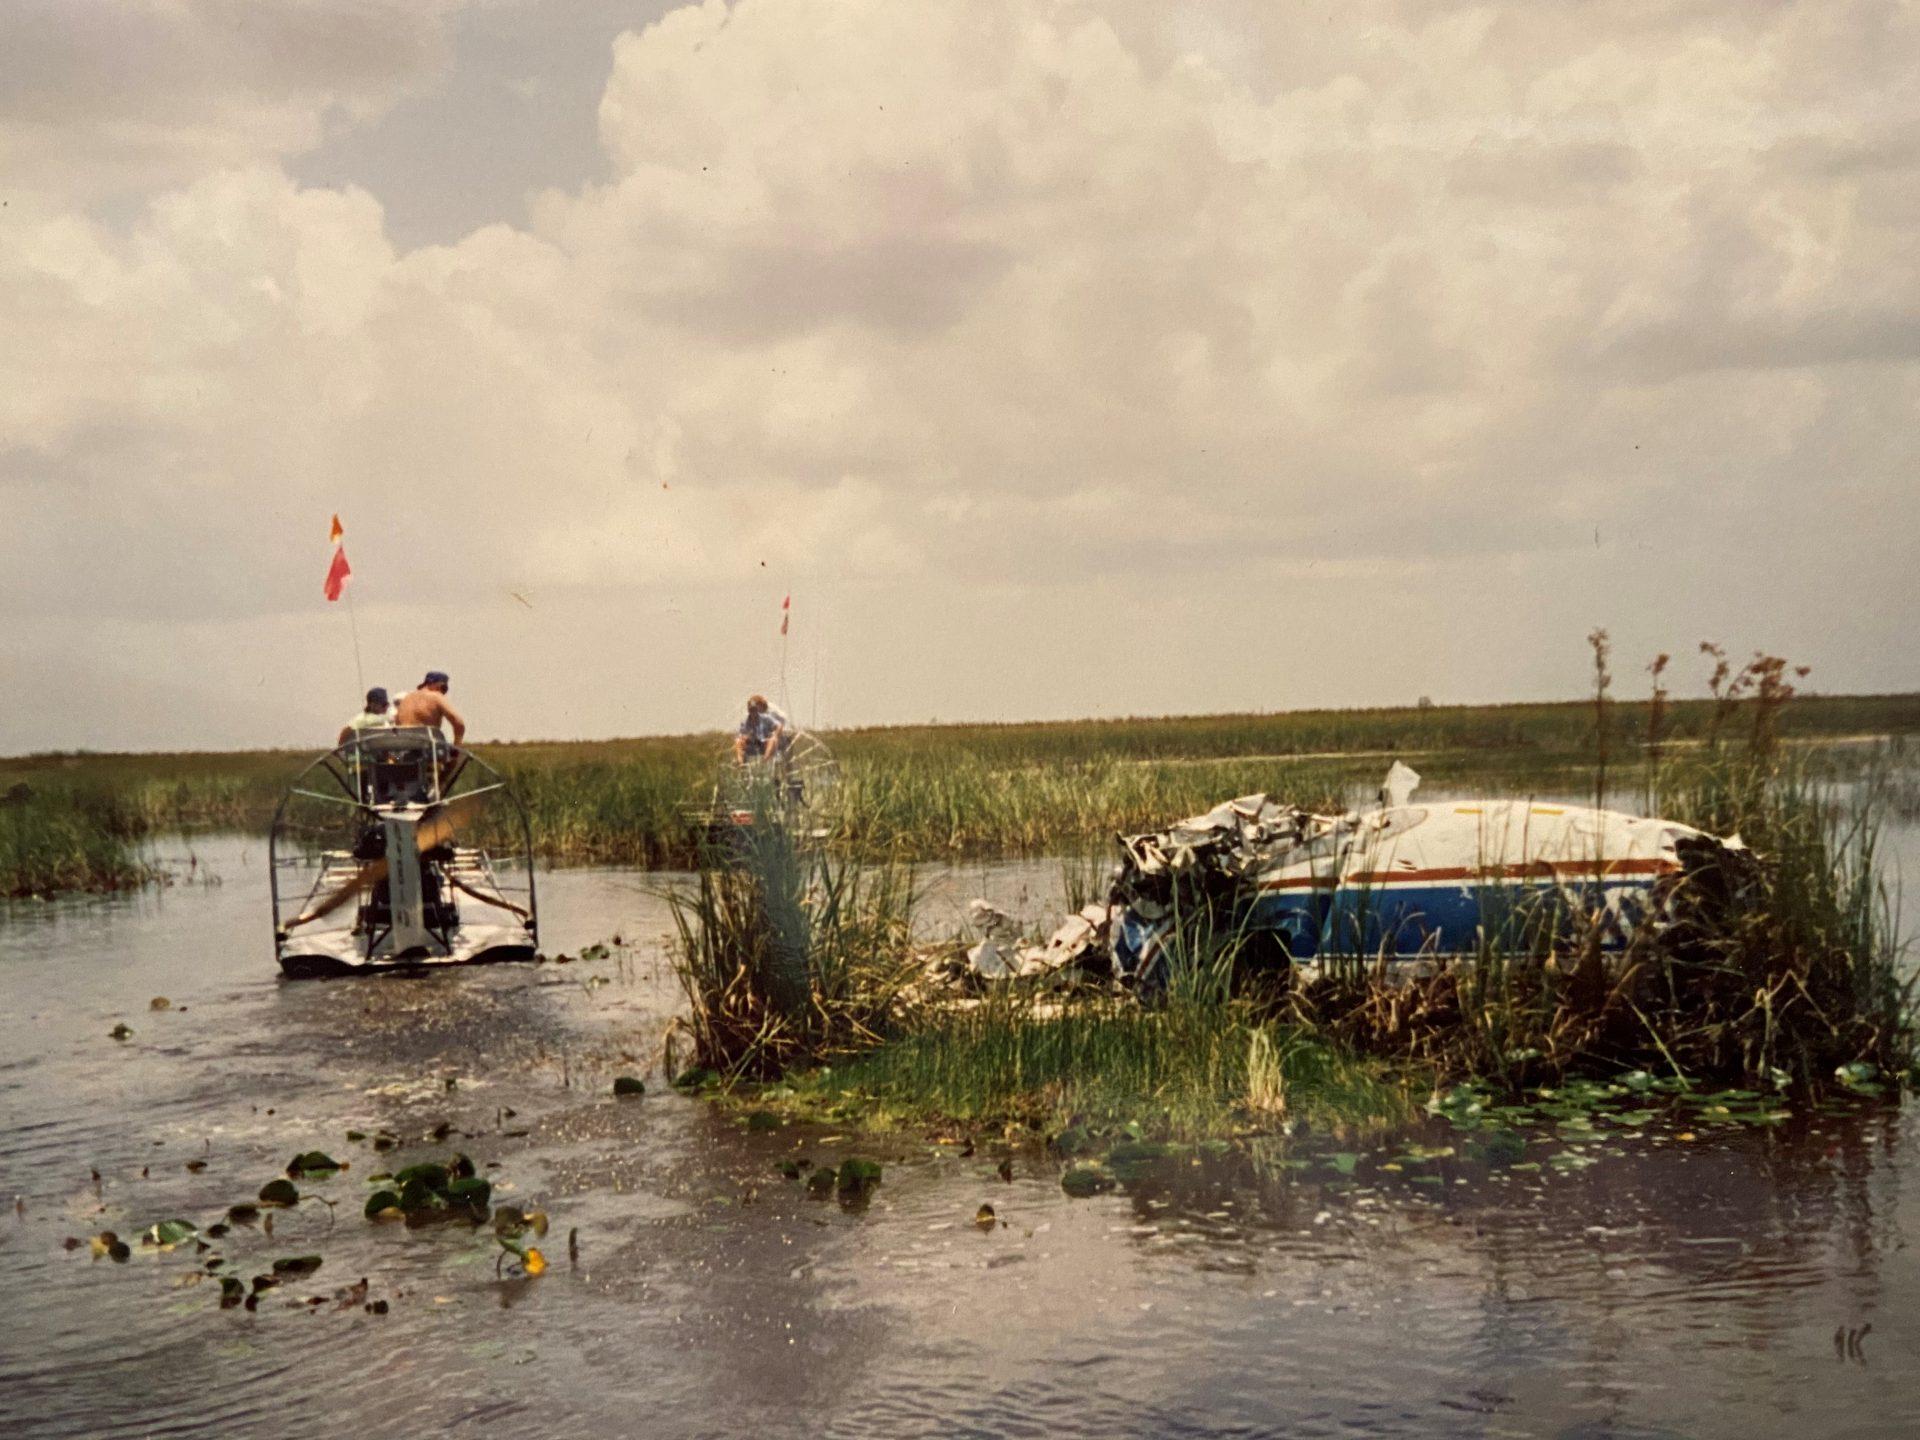 Airplane crash in the Everglades